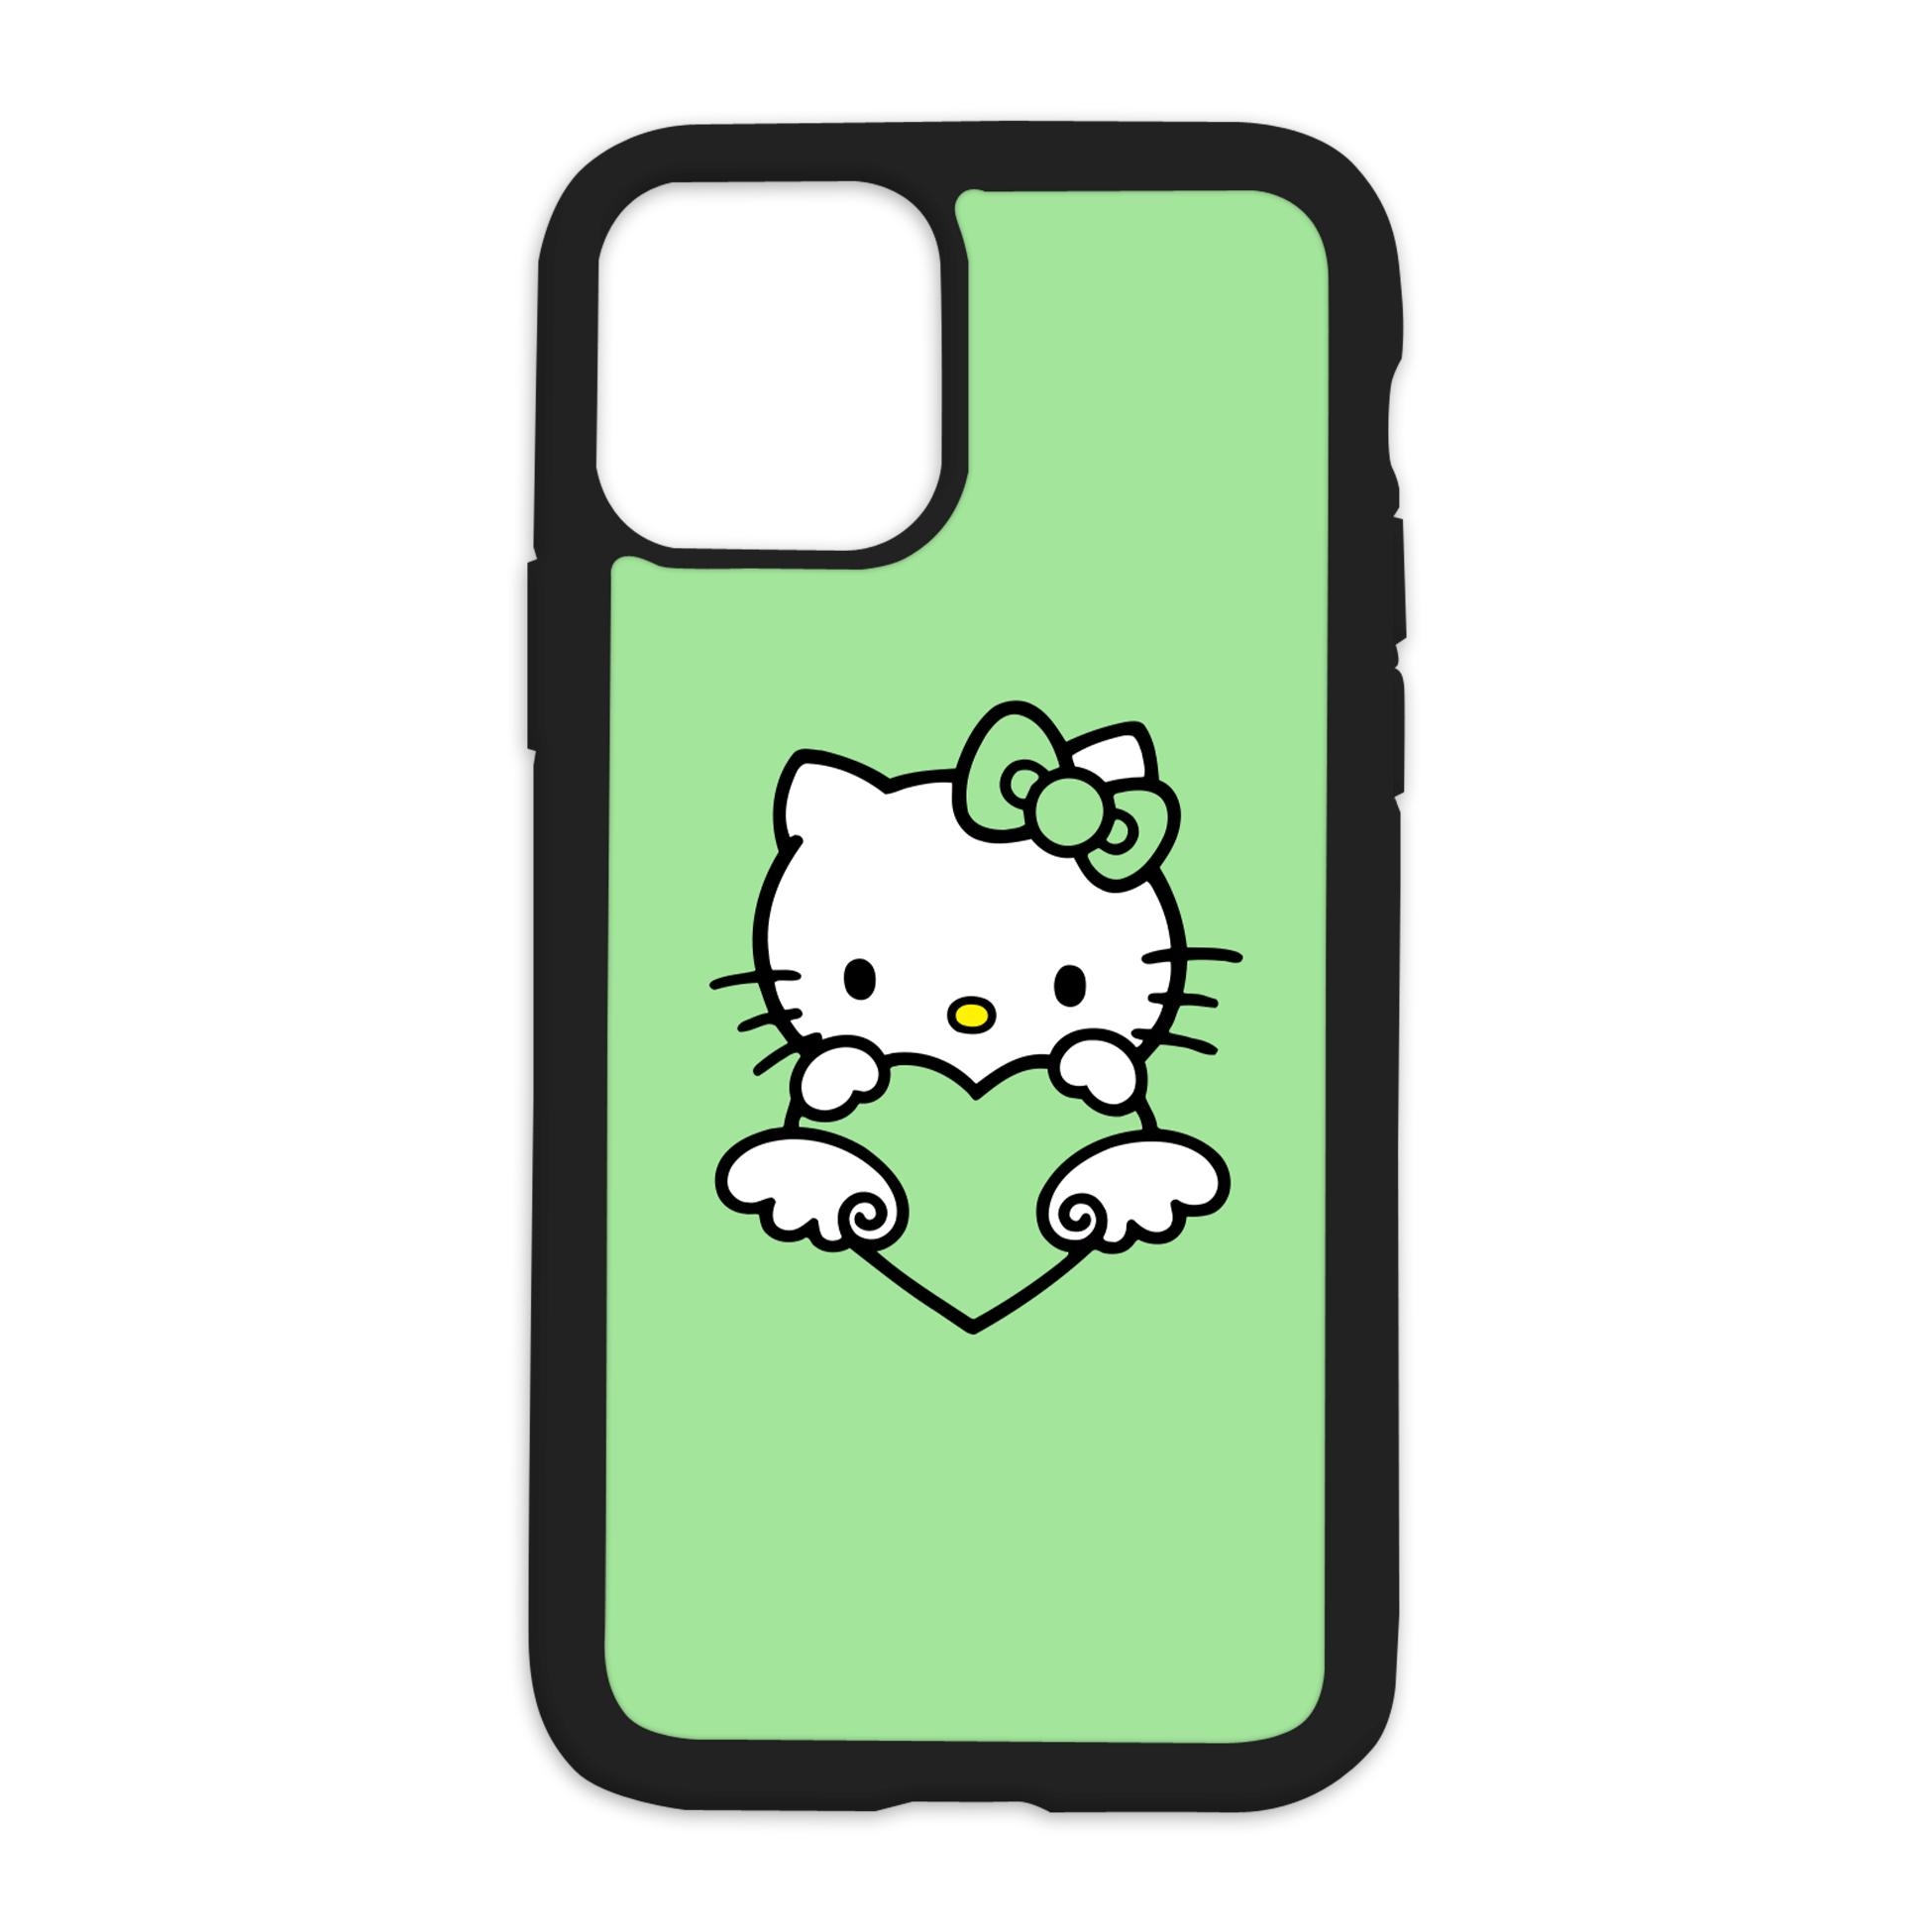 HK Design On Black Phone Case - XR / Green